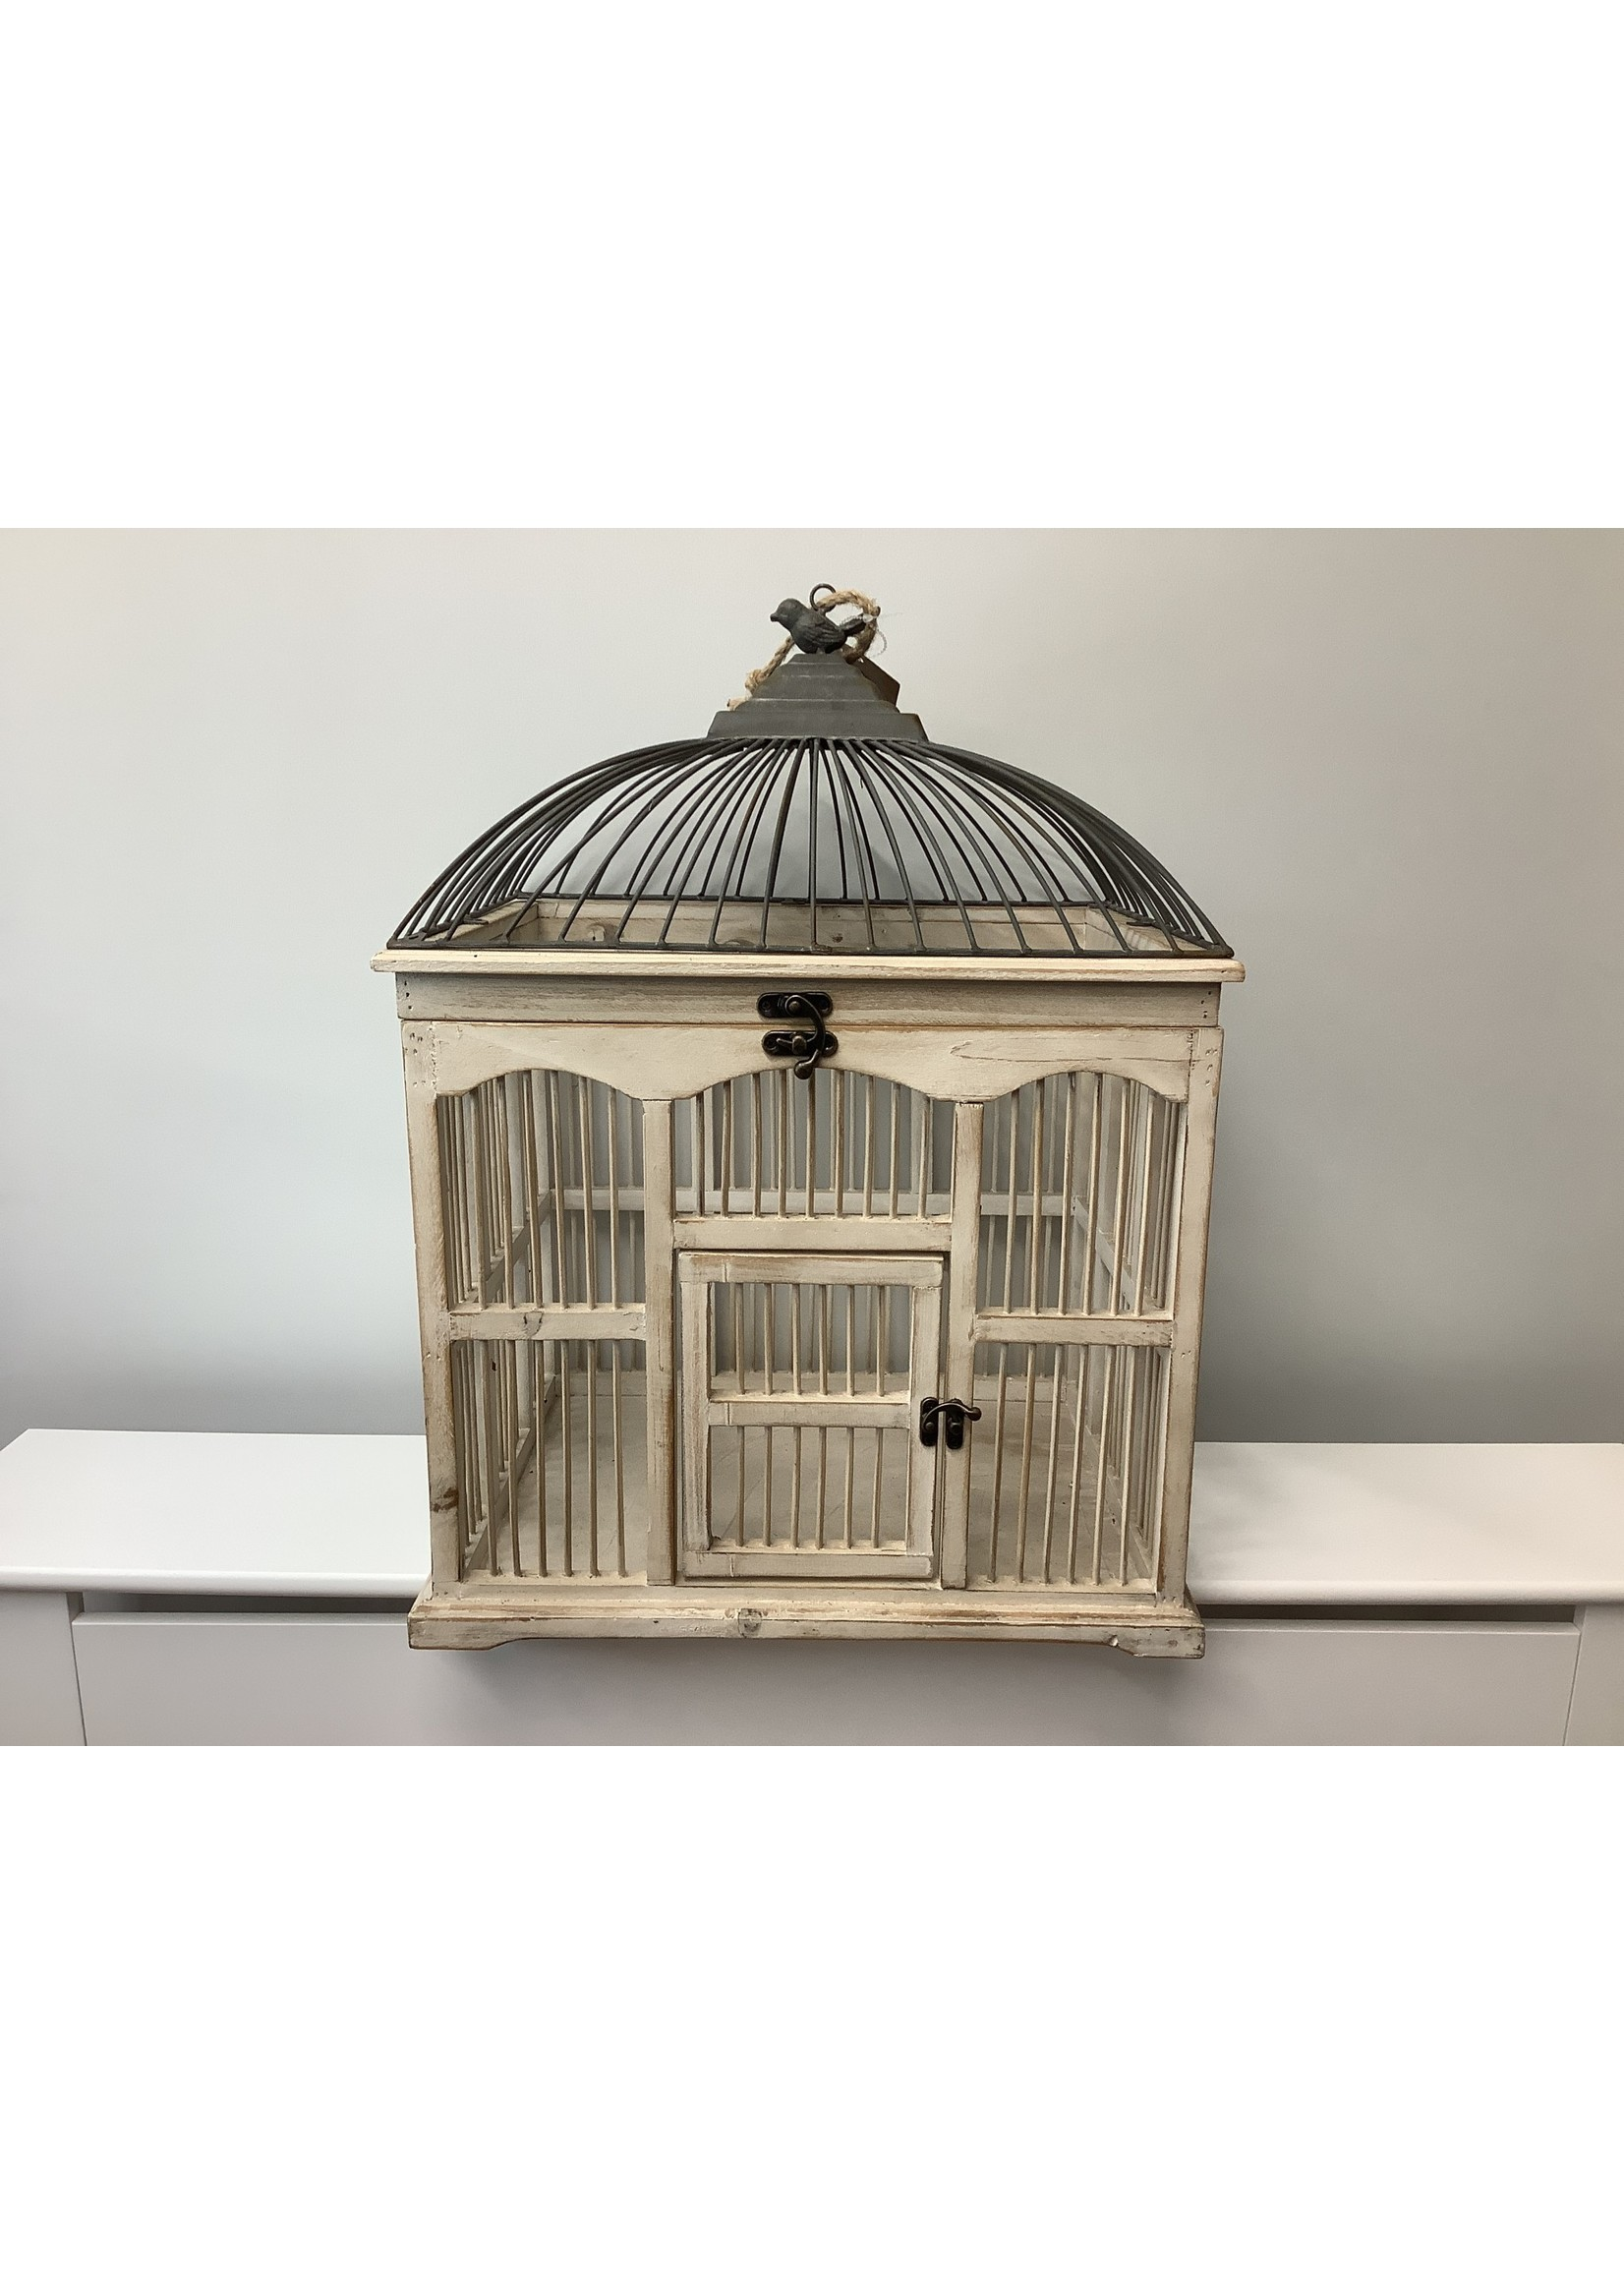 Bird Cage 50cm tall x 40cm wide